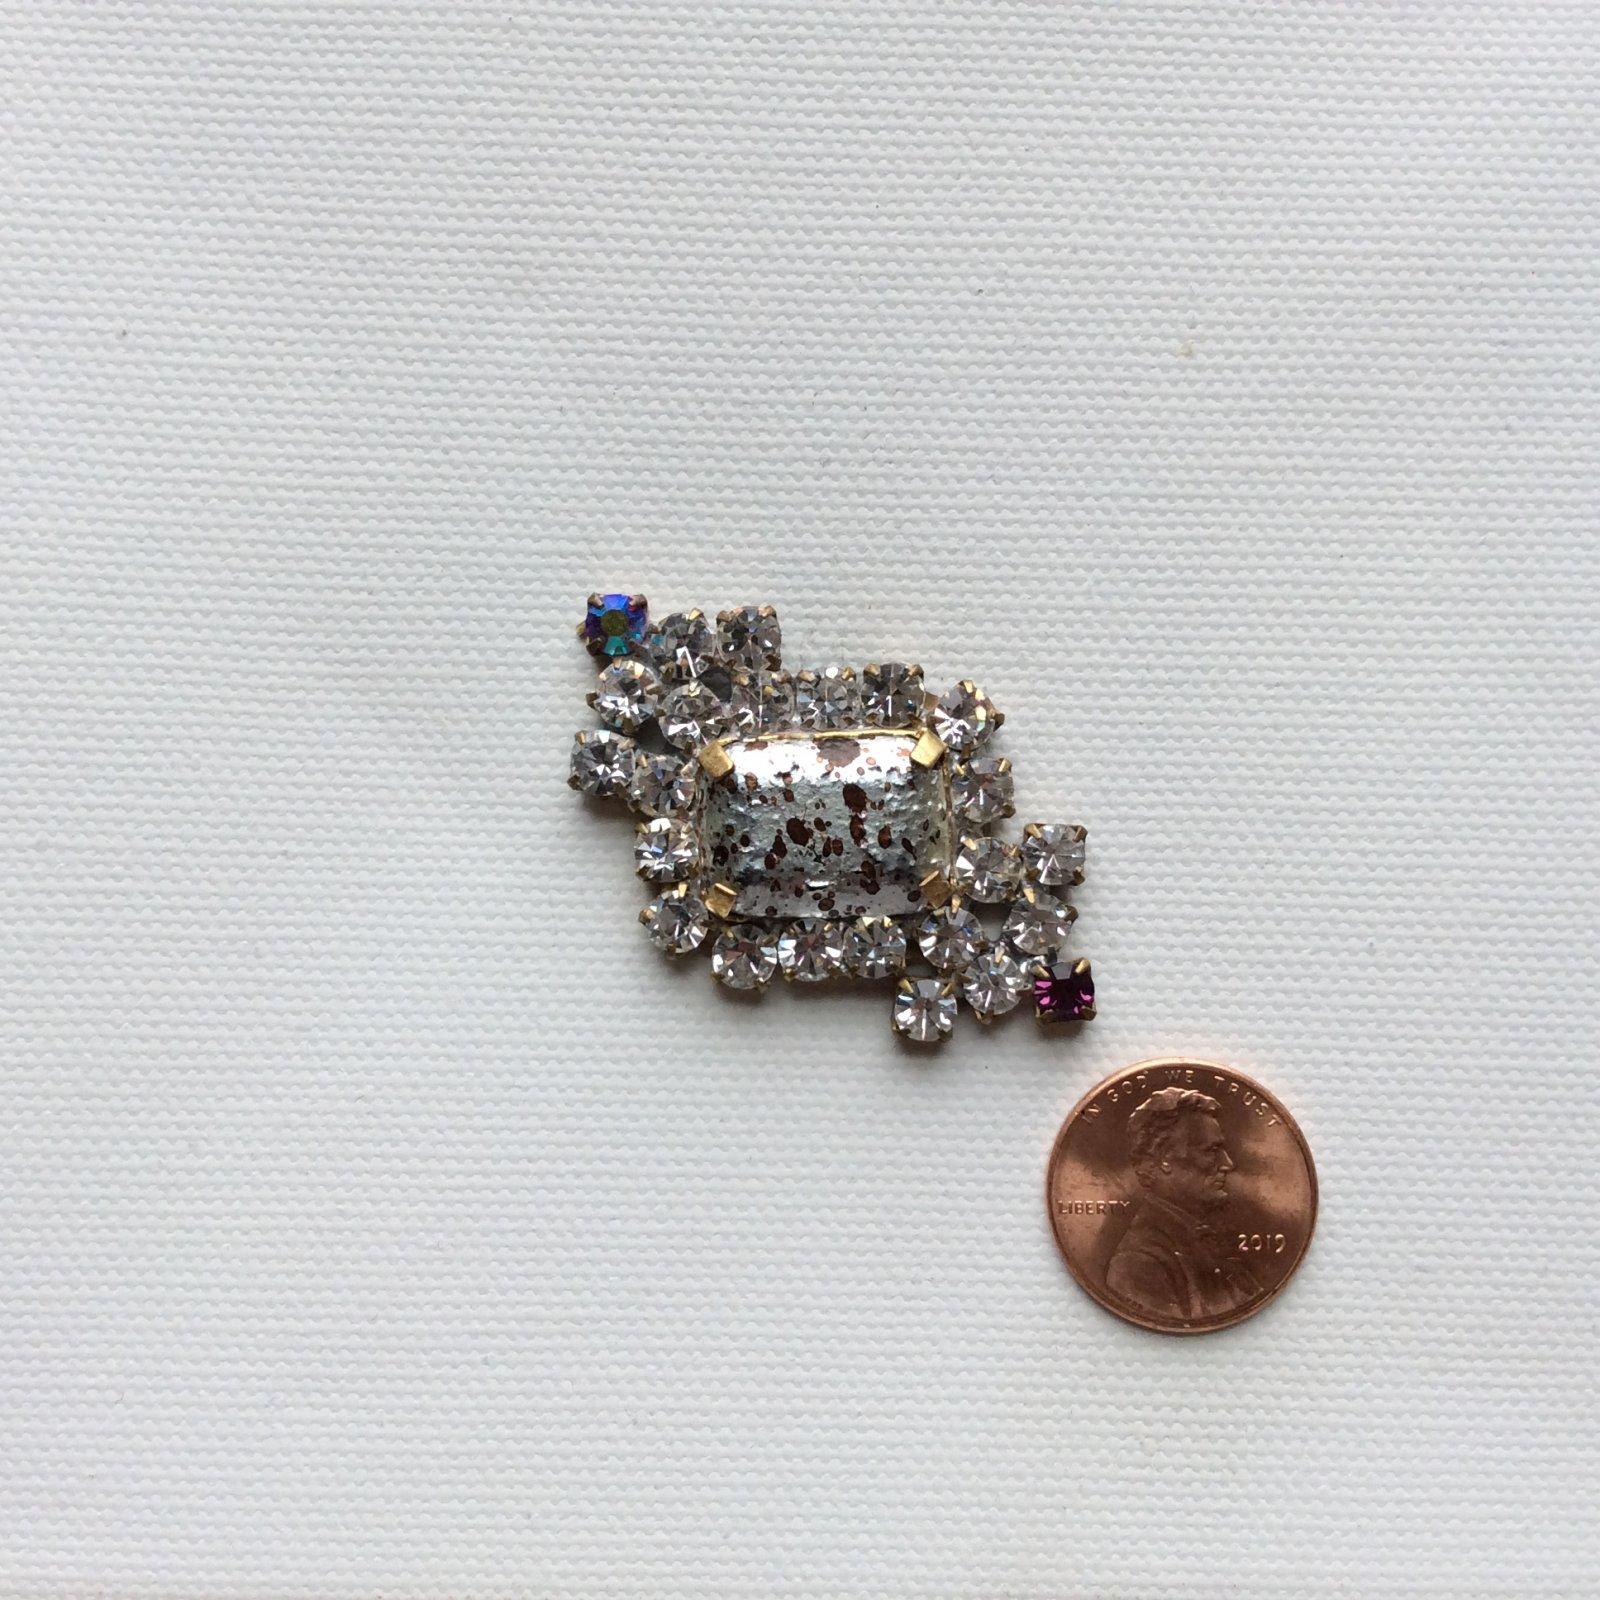 Vintage Czech Glass Rhinestone Jewelry Making Sew on Button Faceted Stone Decorative Costume Jewelry Pendant CZG034